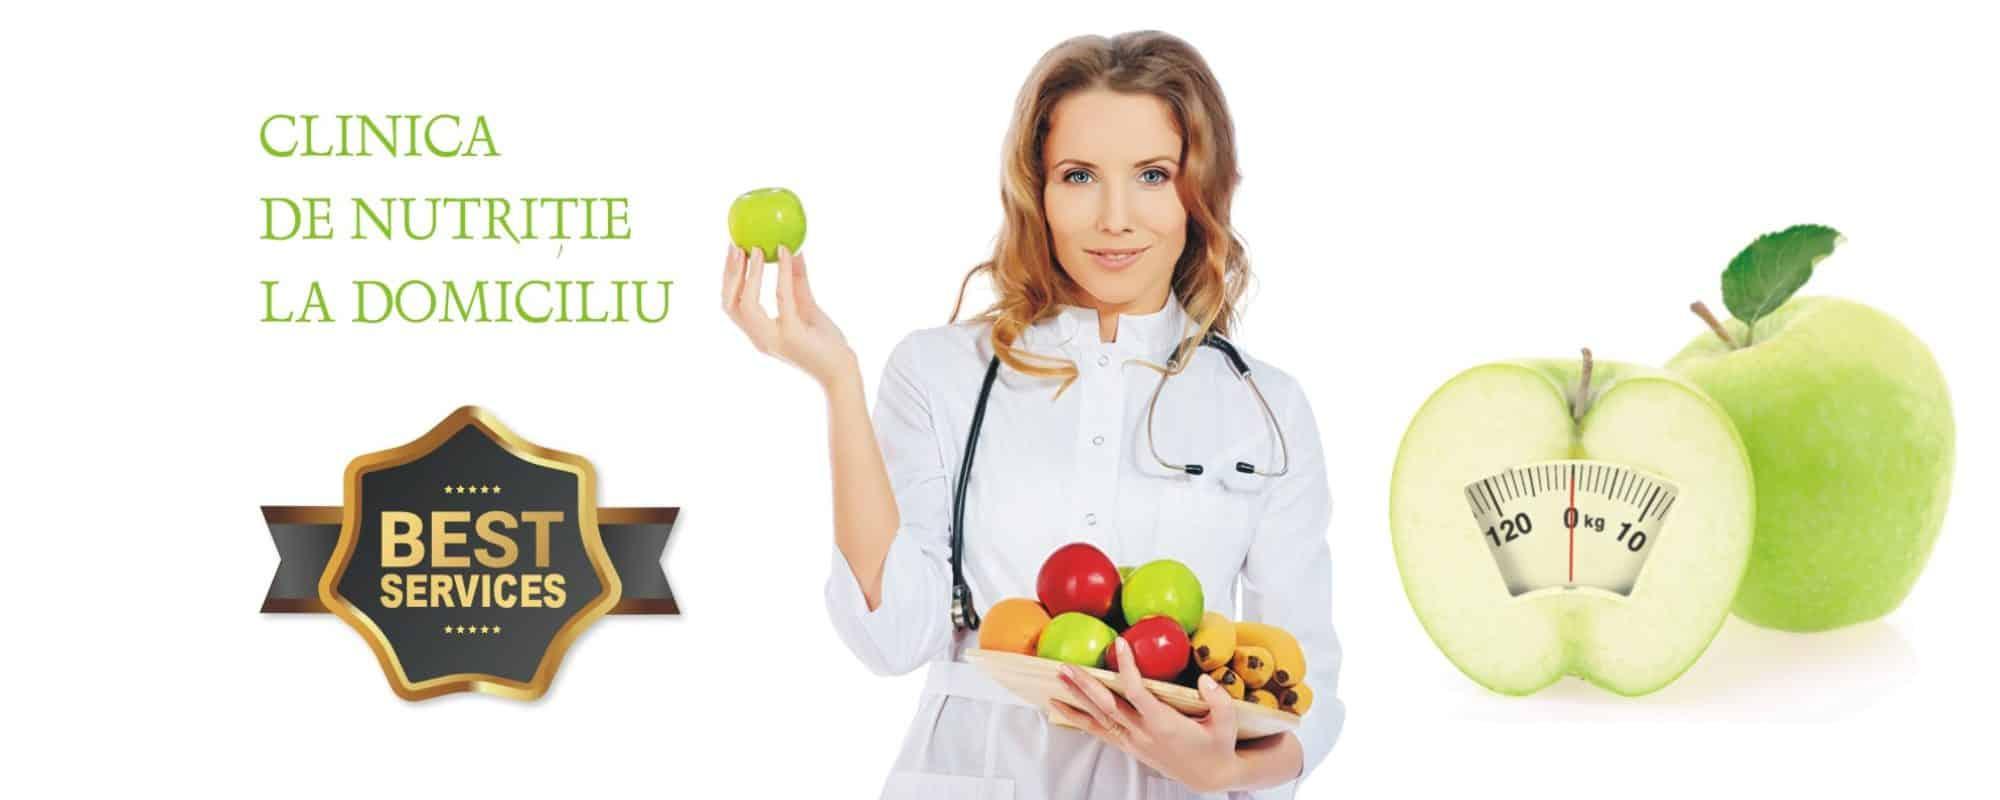 Dietalia, clinica de nutritie in Bucuresti si Ilfov